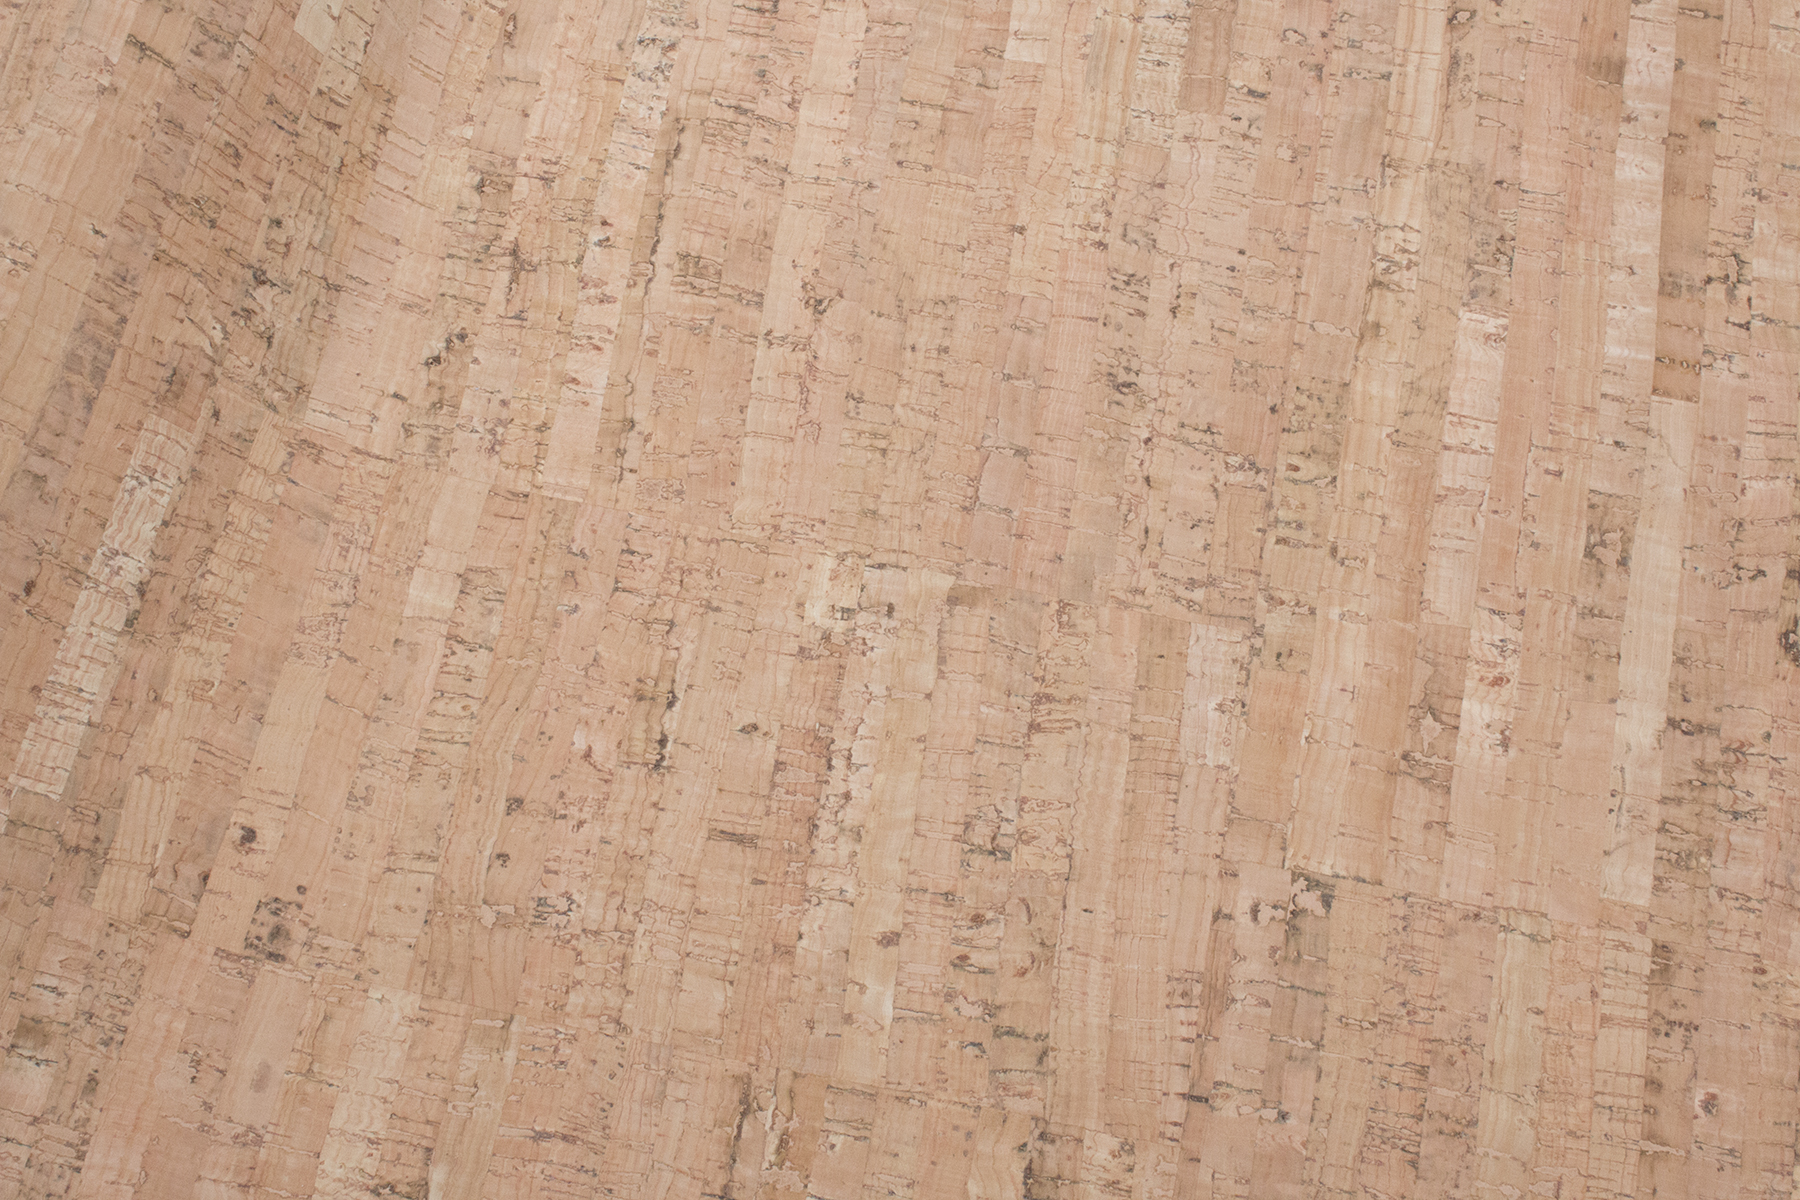 13.7x9.8 35x25cm Cork fabric Sample or size high quality